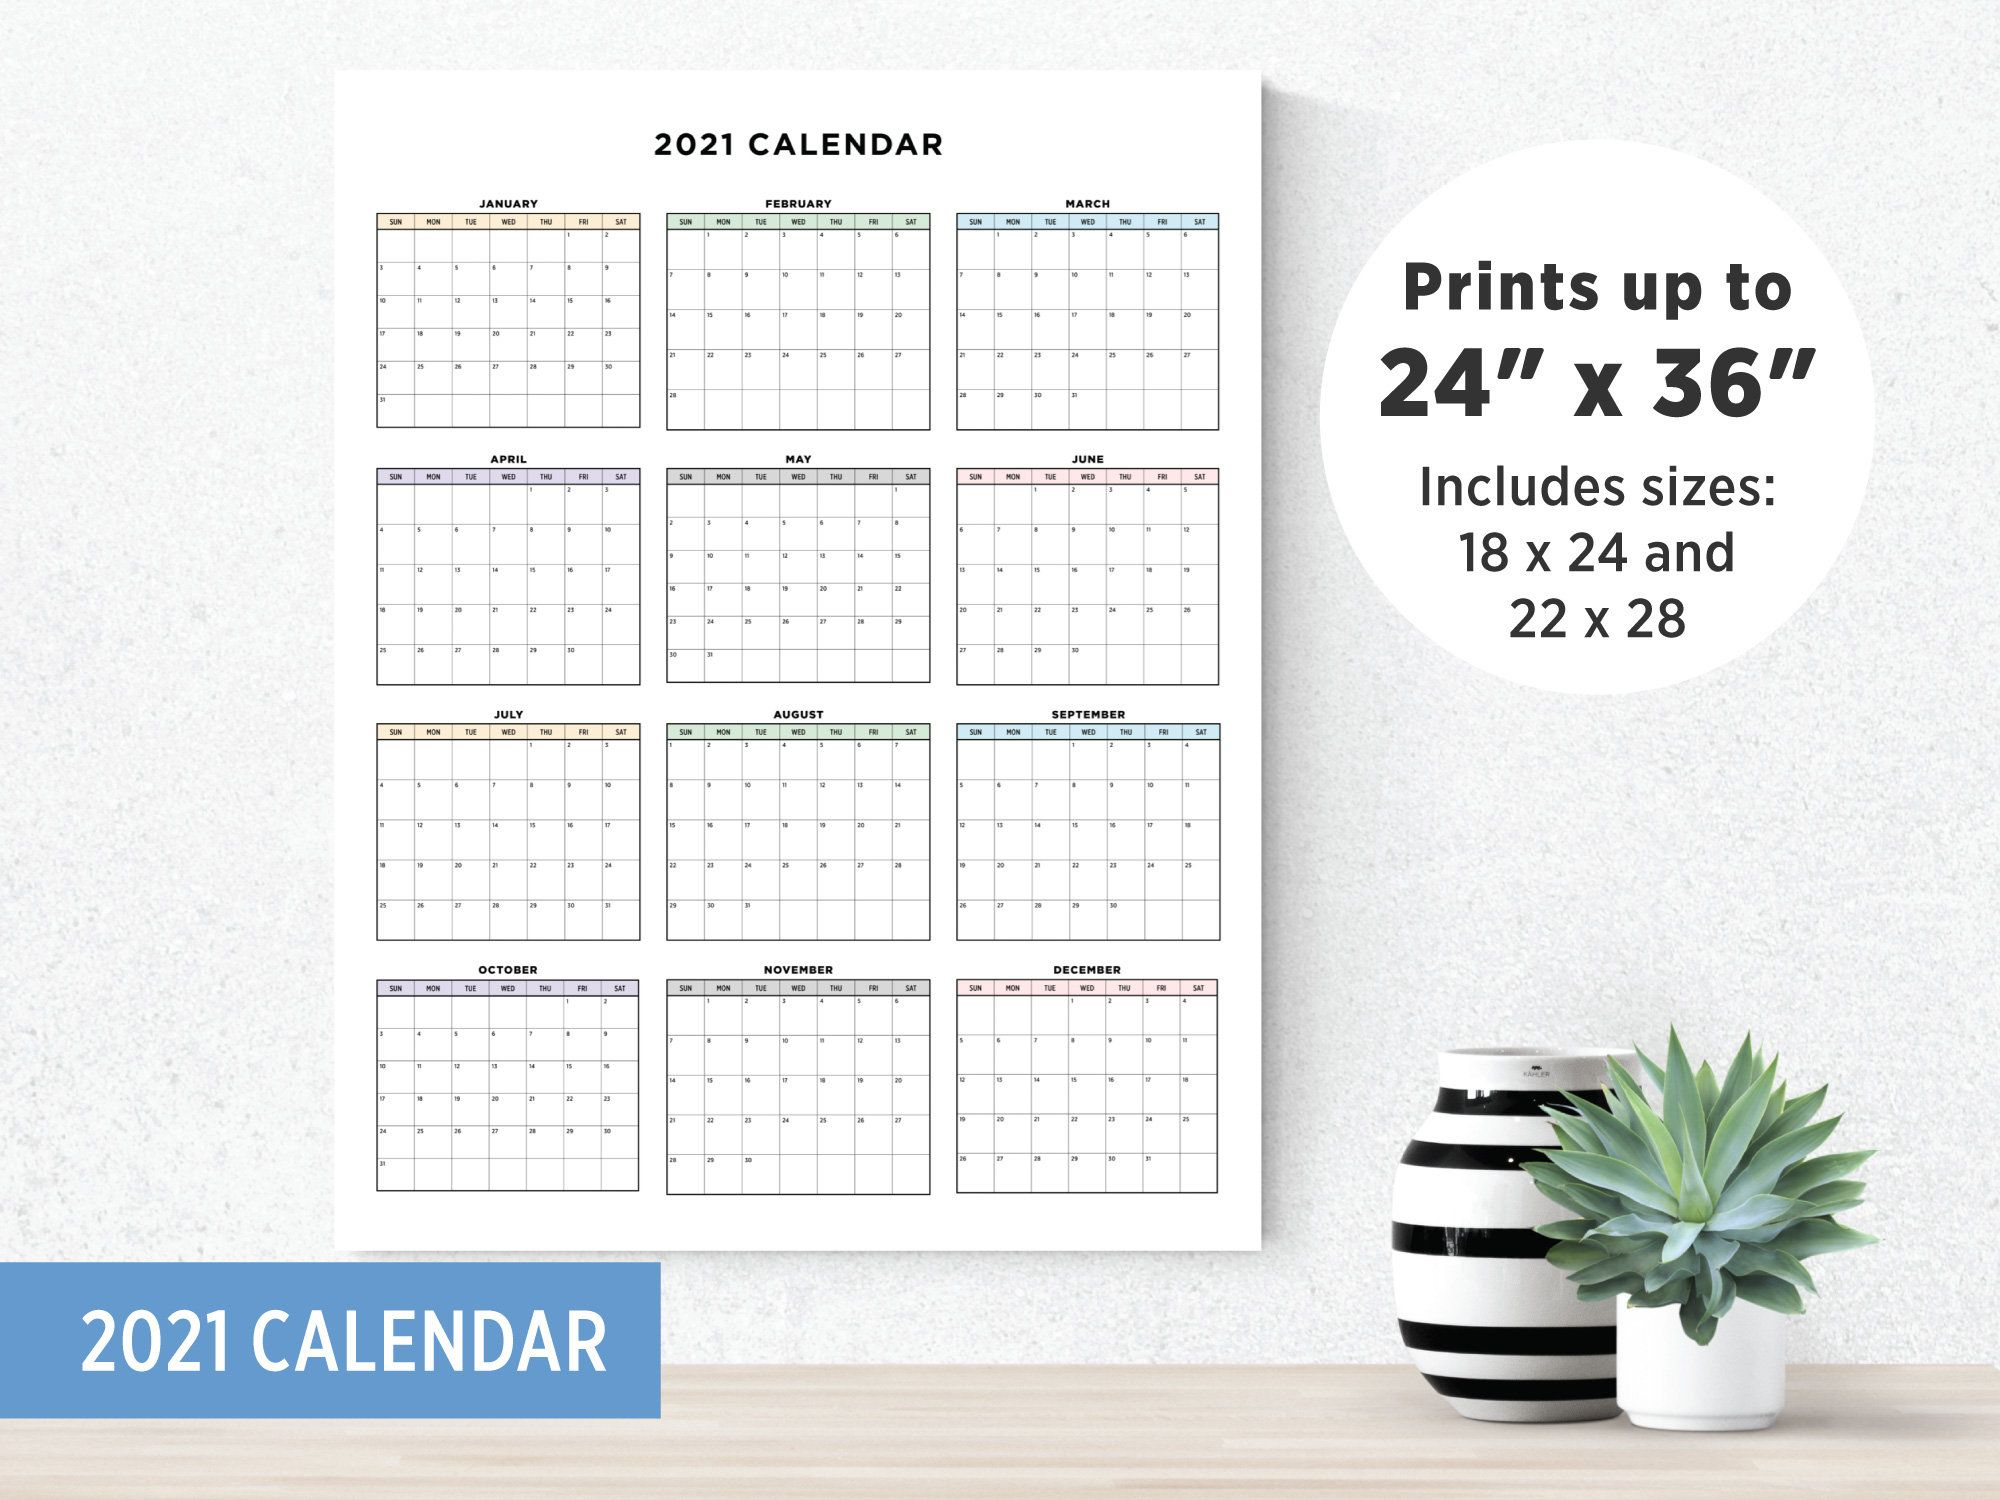 Printable 2021 Calendar Large Calendar At A Glance Etsy In 2020 At A Glance Calendar Print Calendar Large Calendar